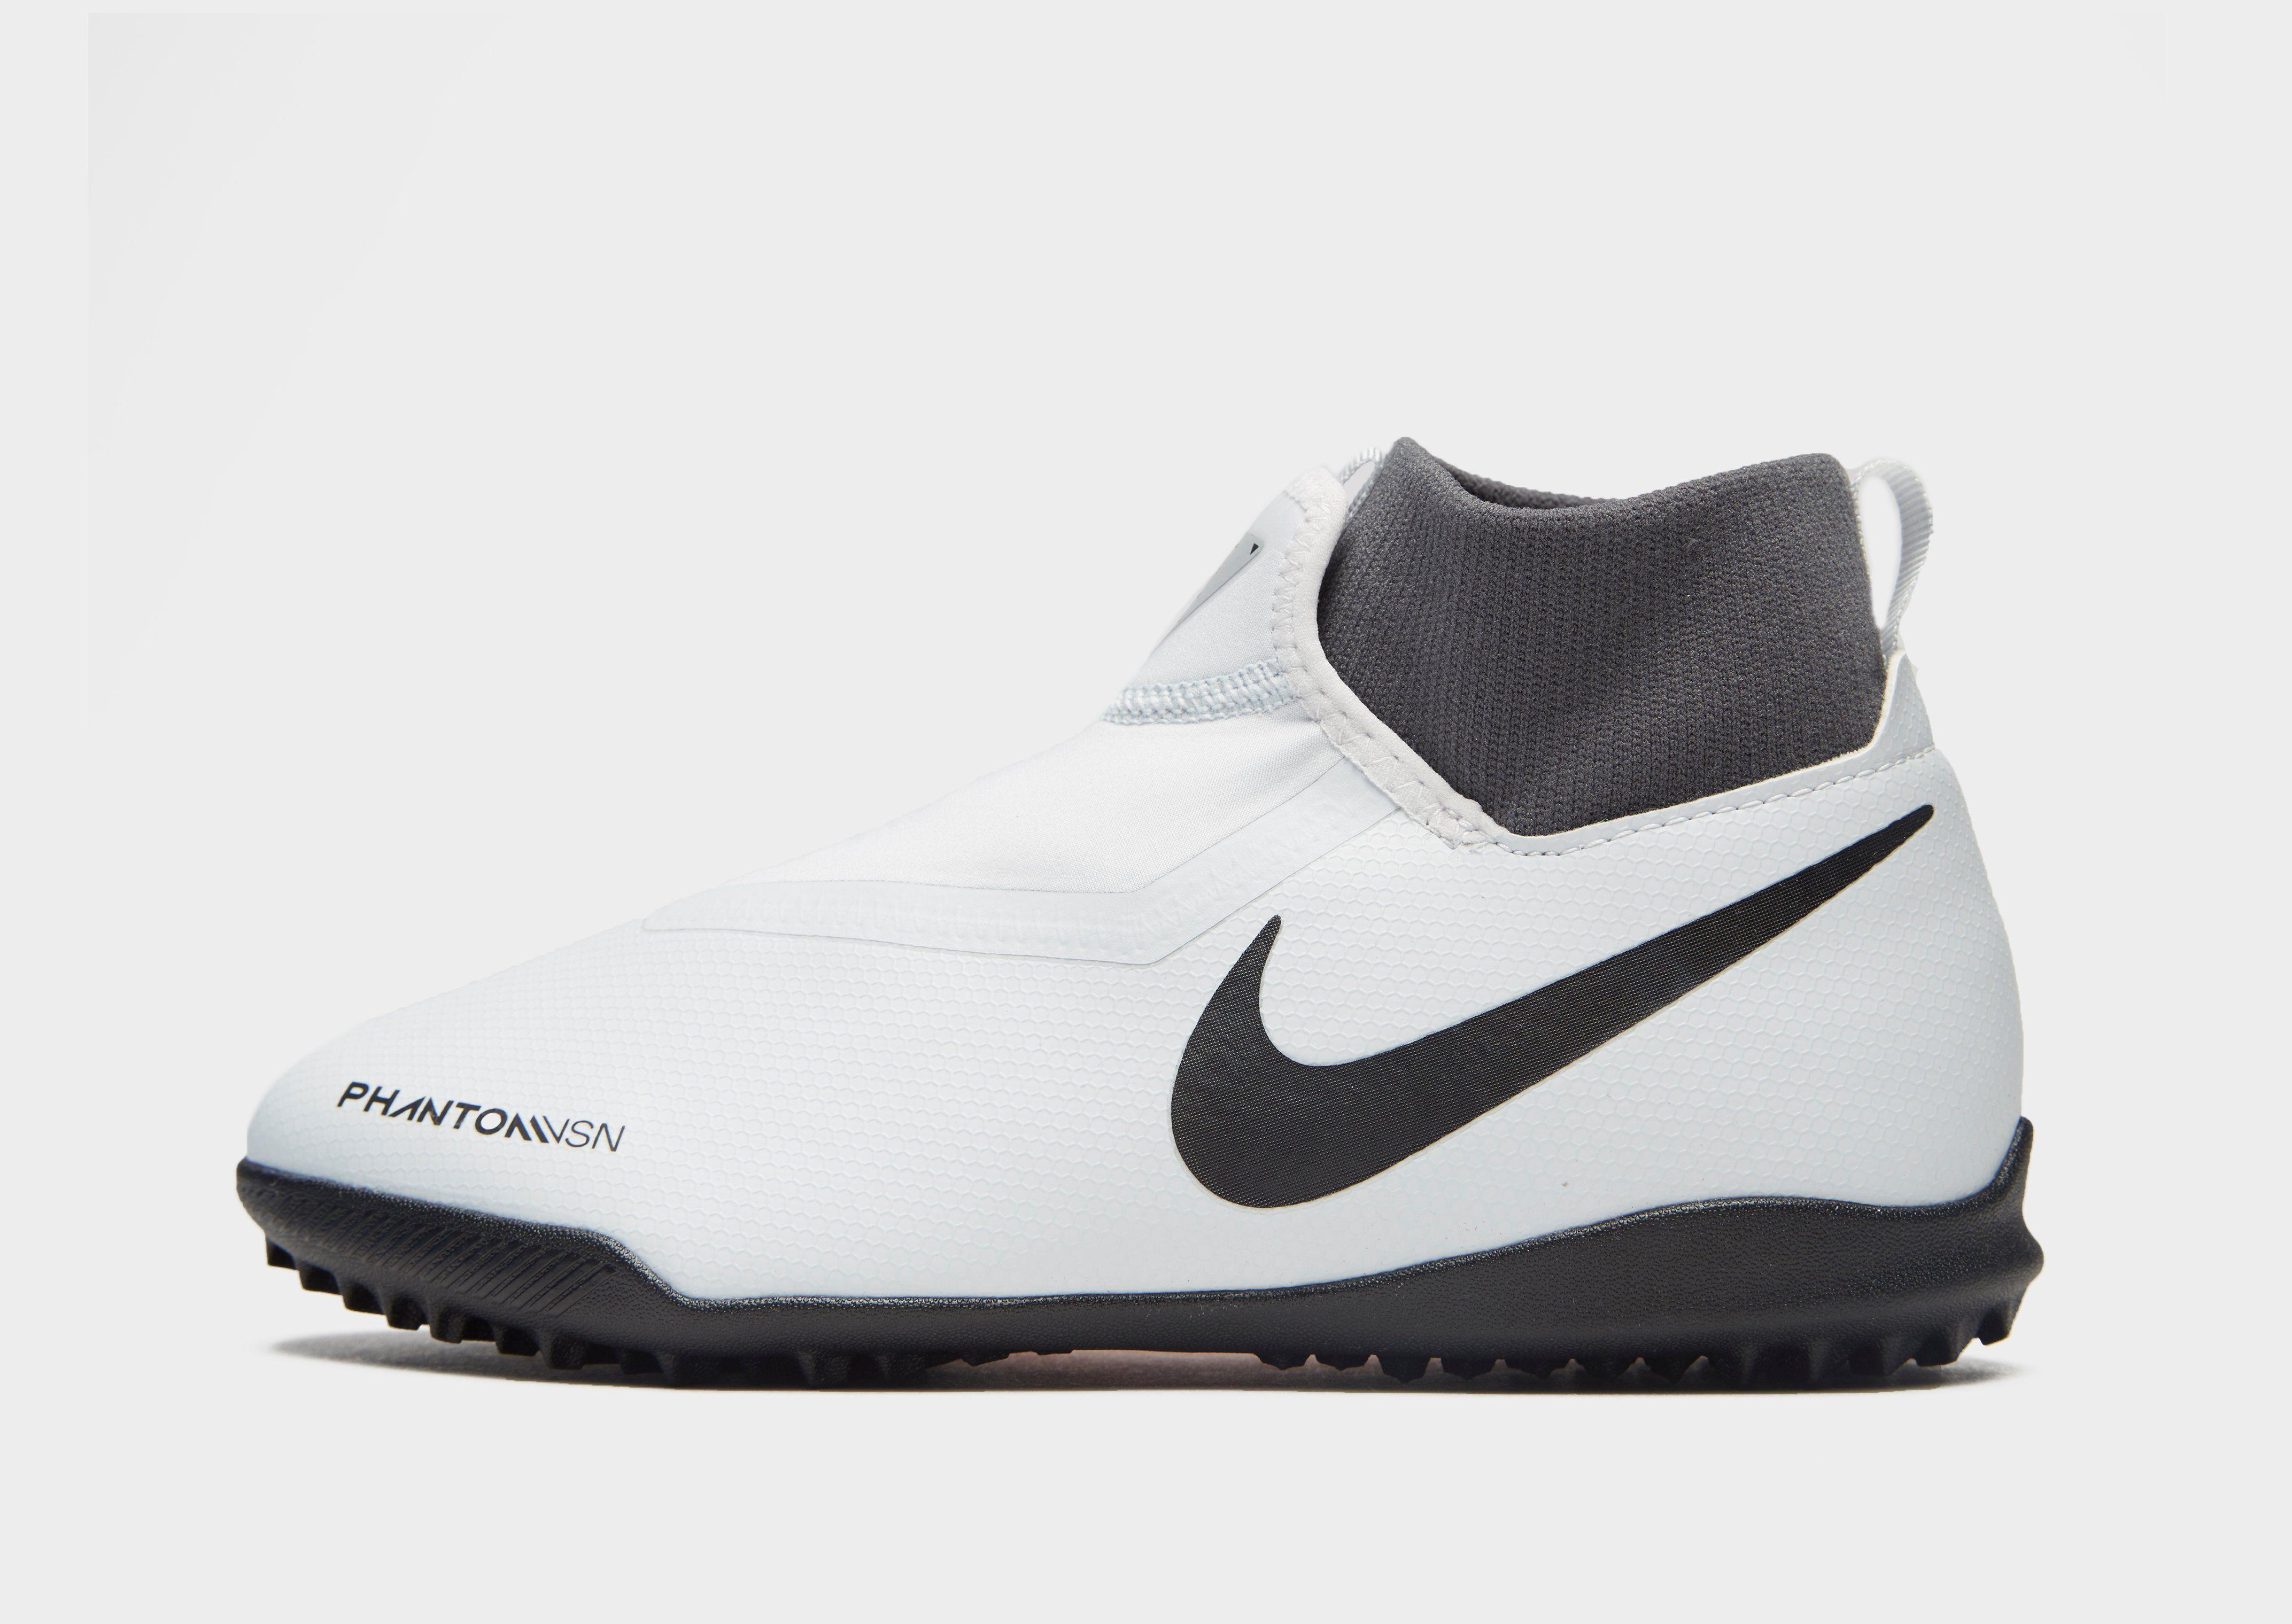 beba0cda9ef NIKE Nike Jr. Phantom Vision Academy Dynamic Fit Younger Older Kids  Turf  Football Shoe